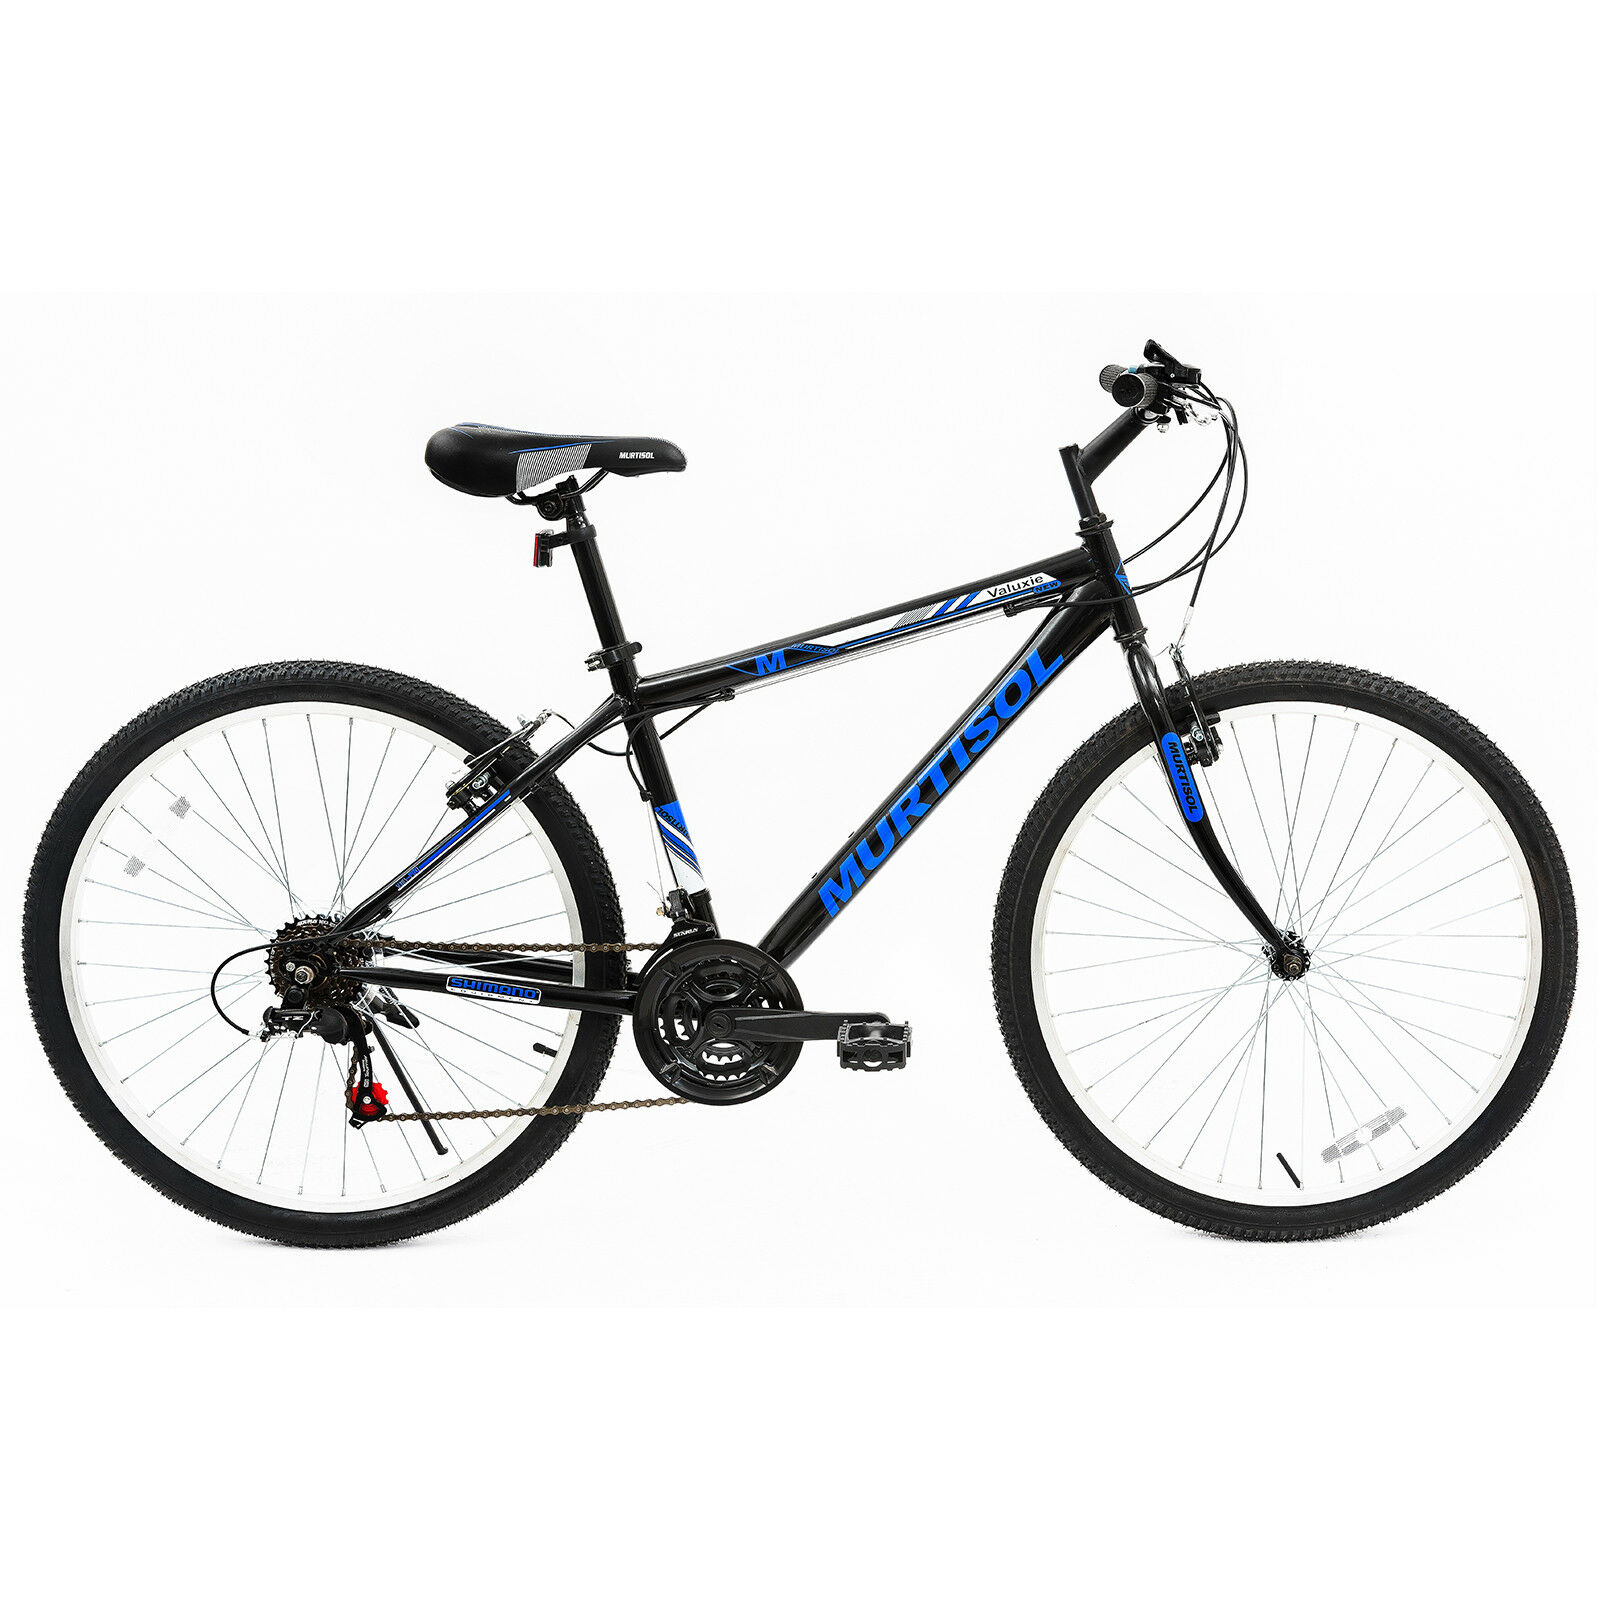 Kenwell 26'' Mountain Bike Bicycle 18 Speed Front Suspension Hybrid Bike Shimano